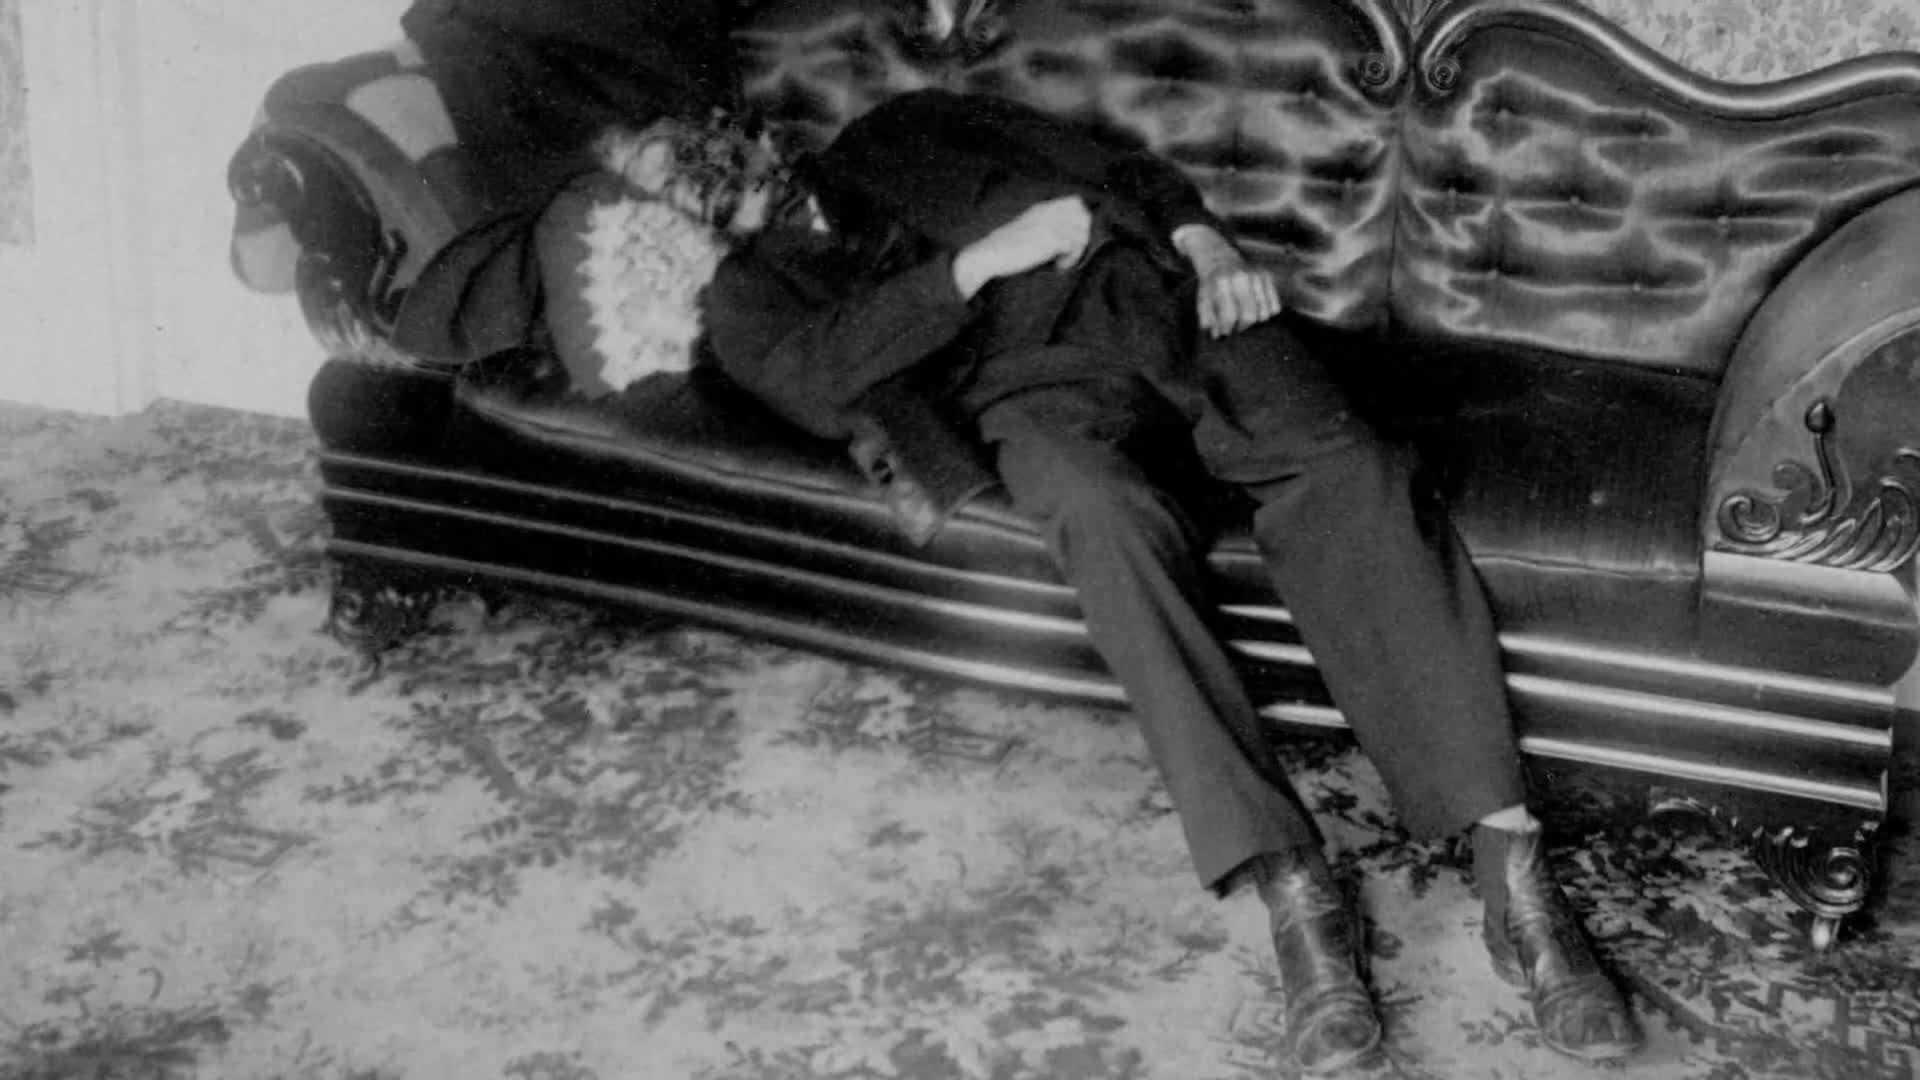 Lizzie Borden House: The Murders